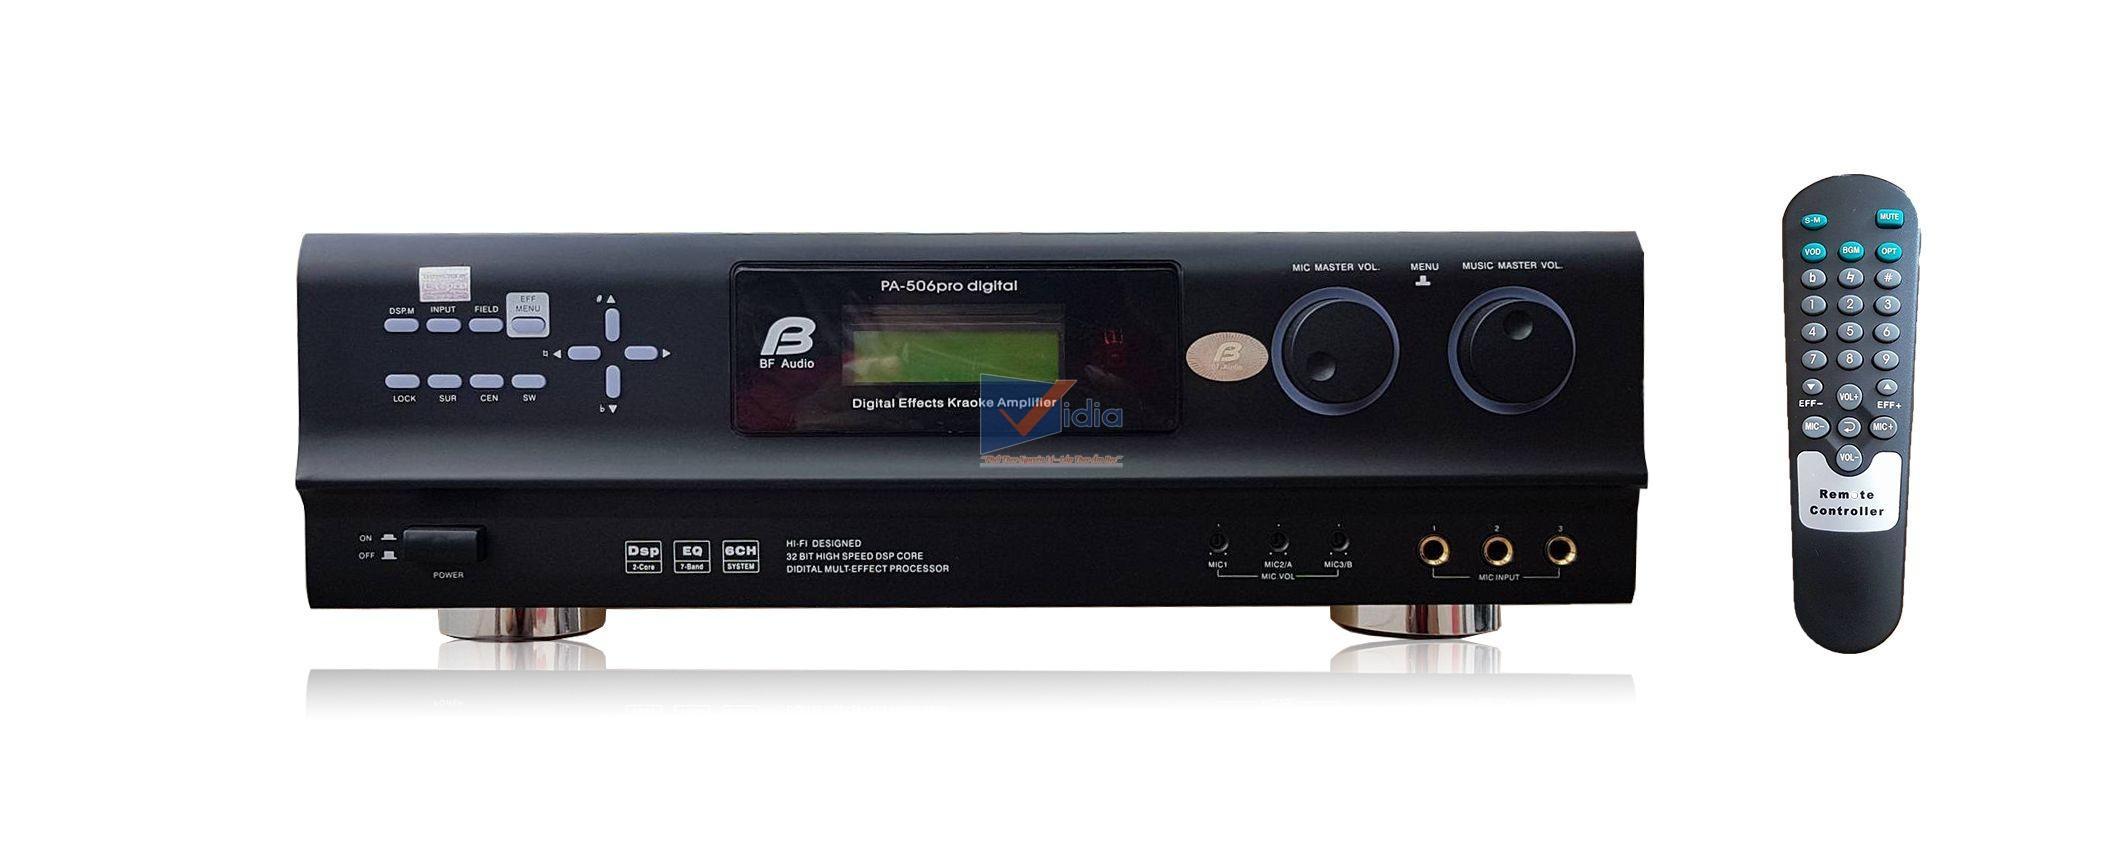 amply karaoke chống hú Bfaudo PA 506 Pro Digital